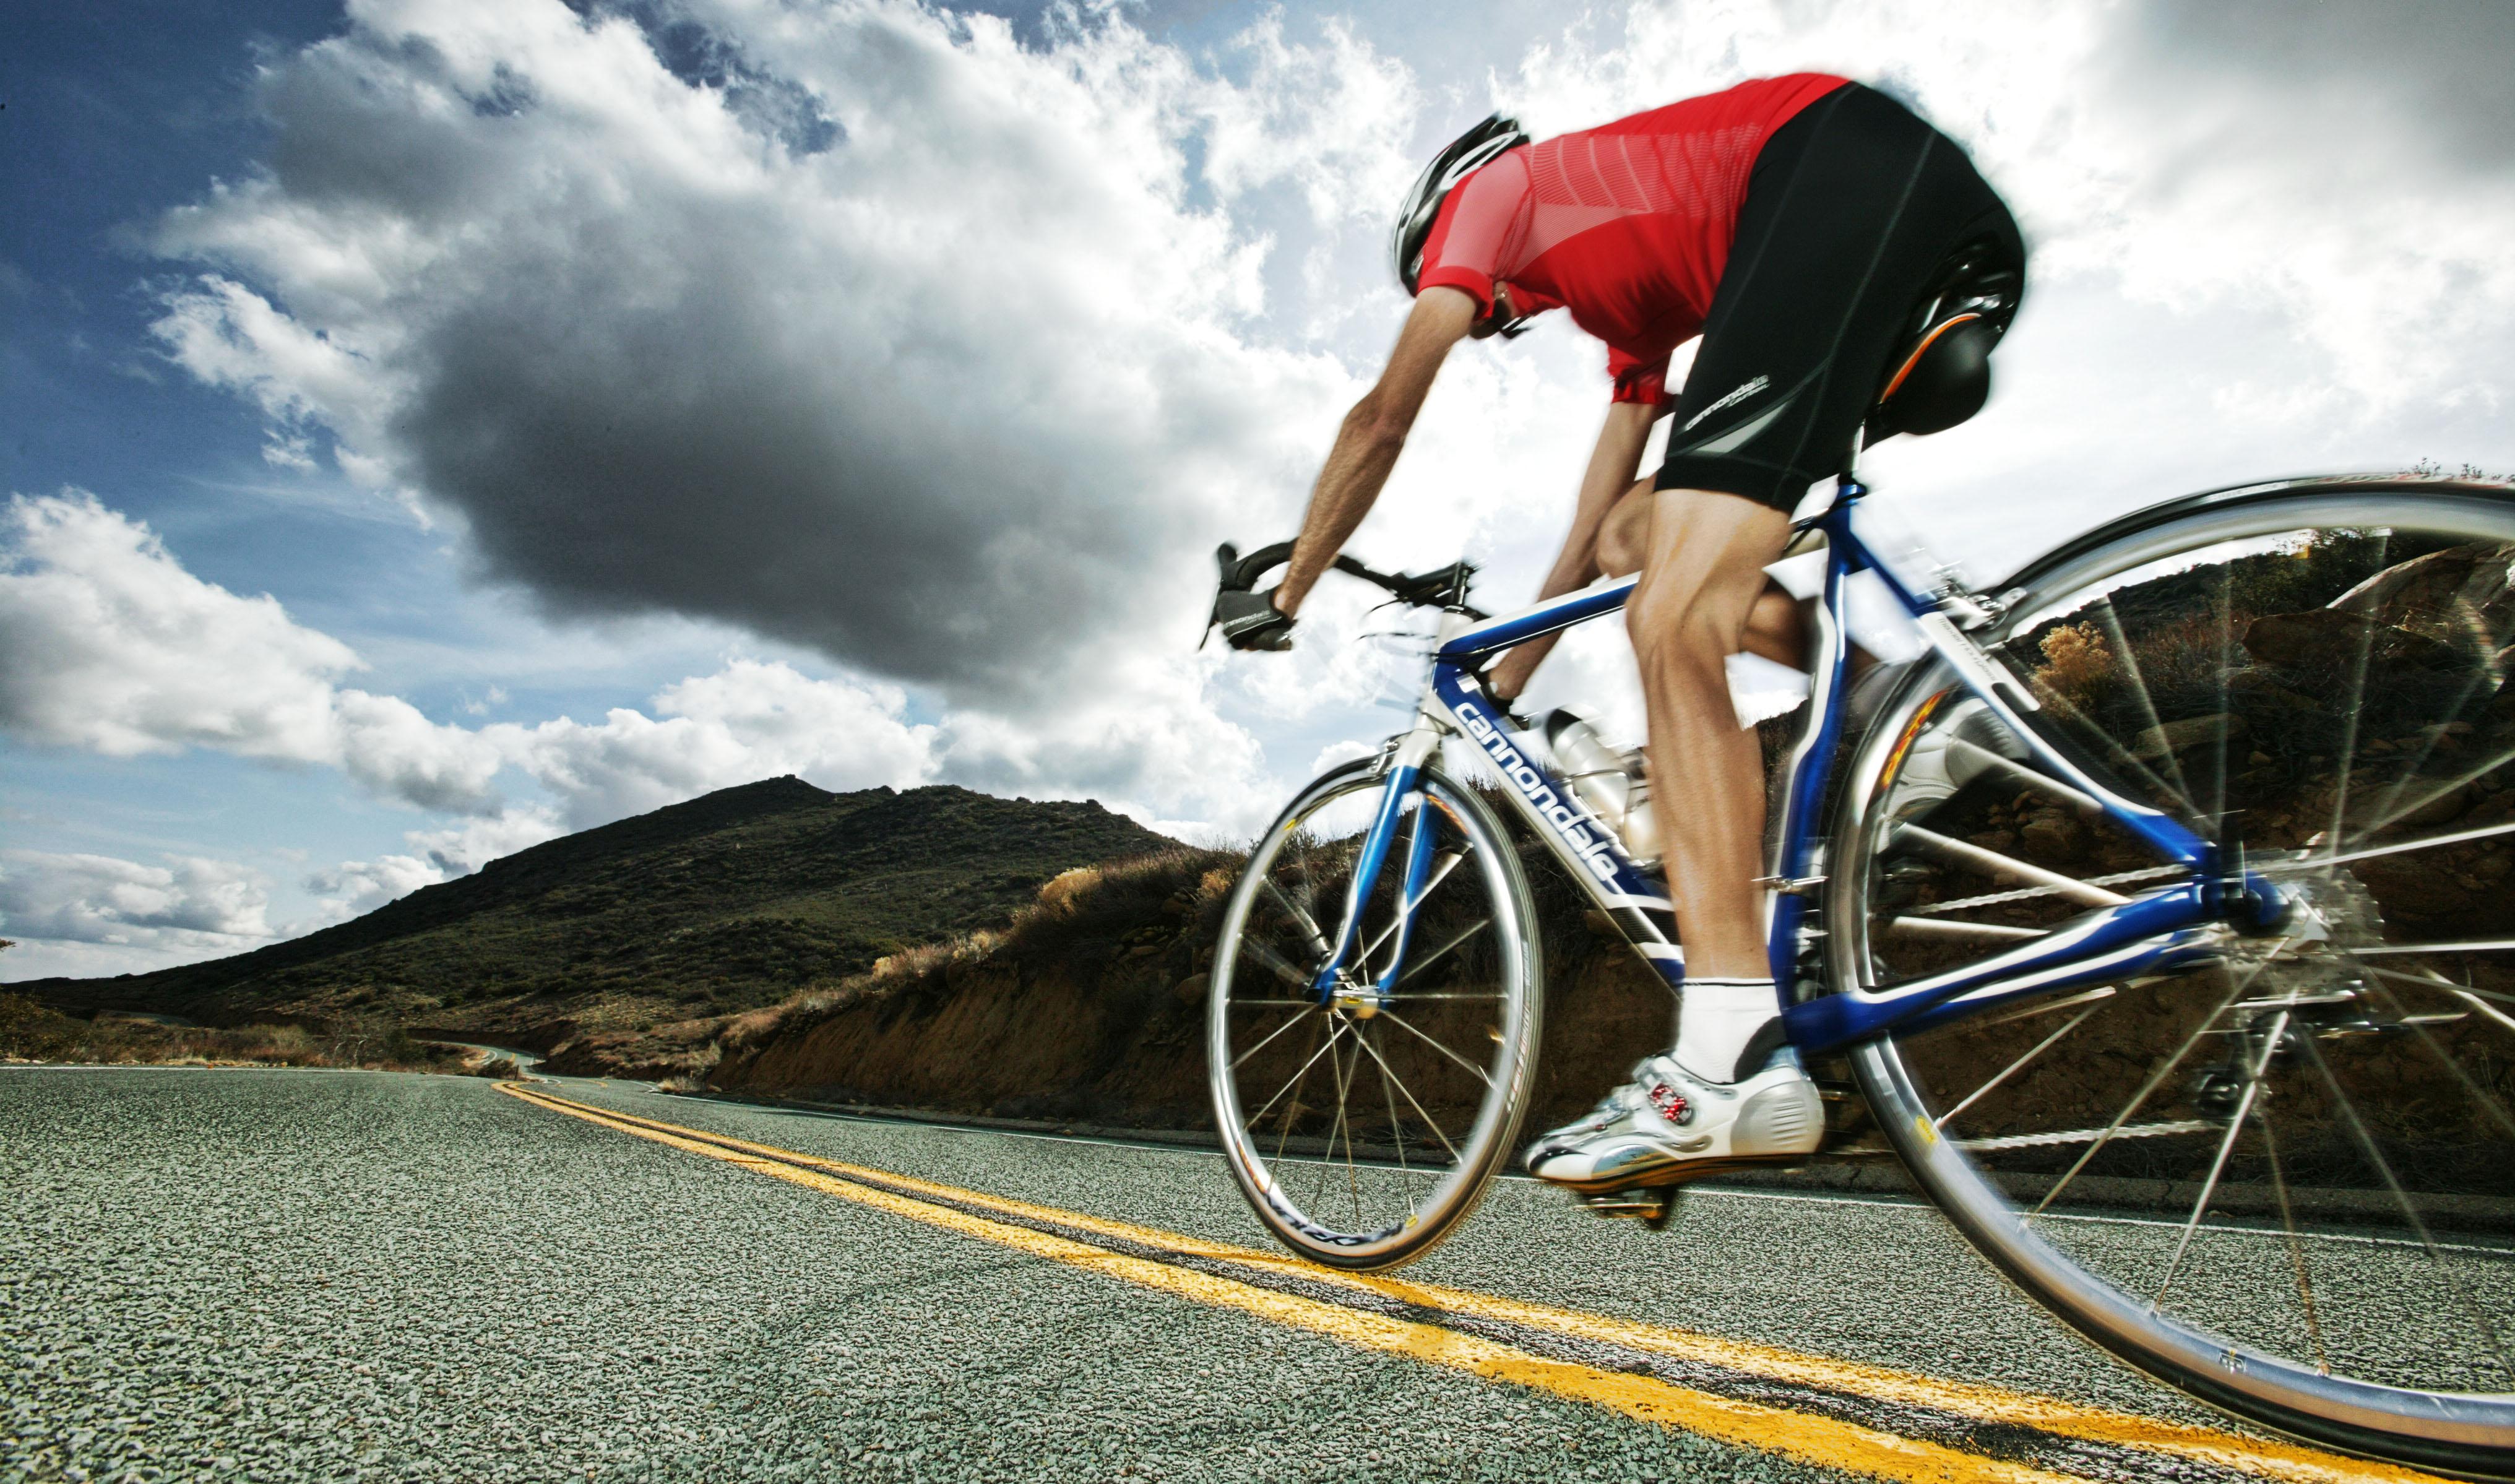 High Resolution Wallpaper | Cycling  4064x2398 px